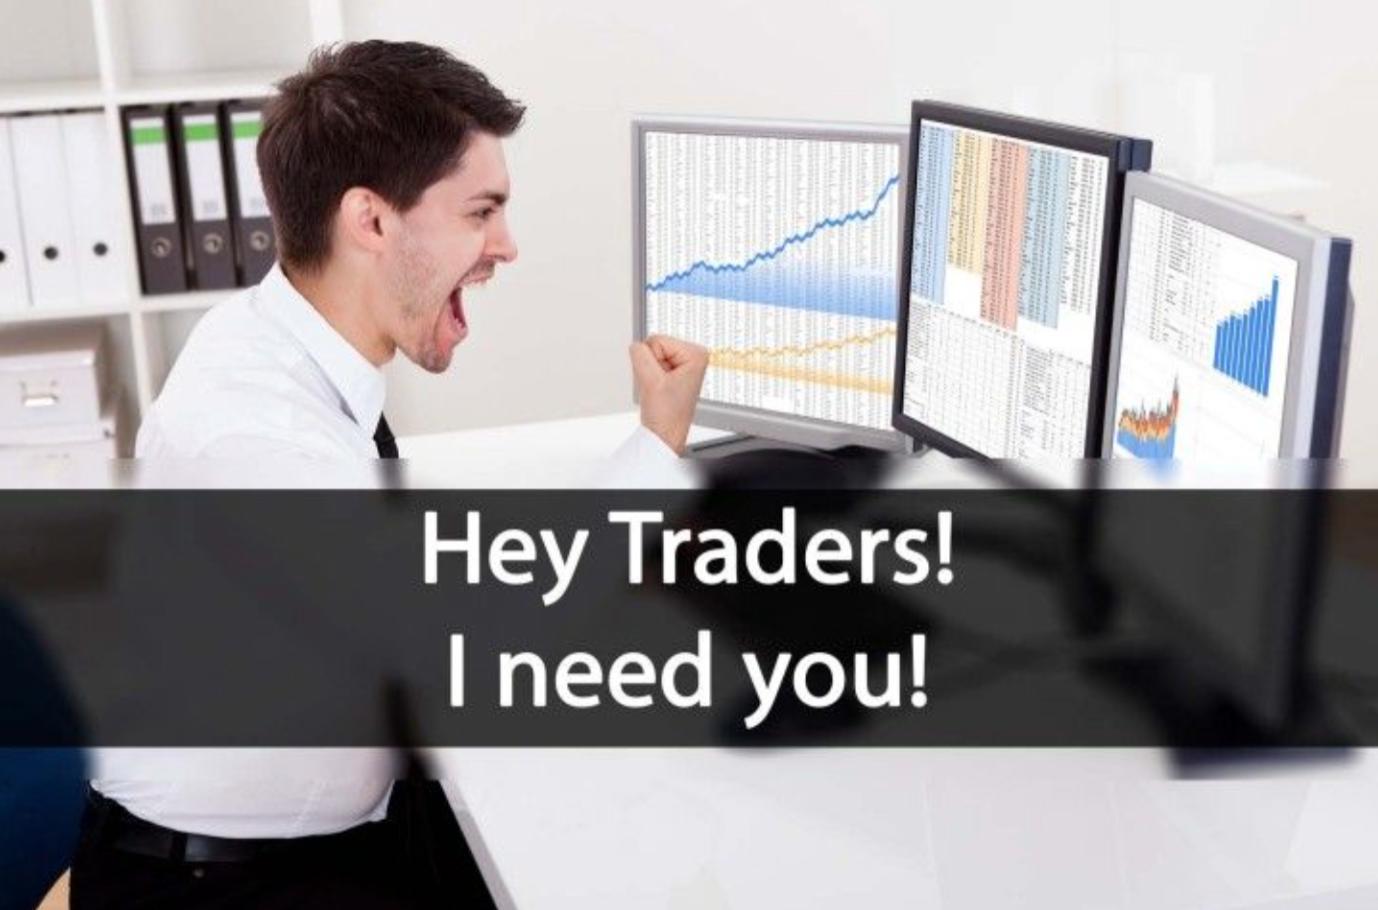 traders we need you